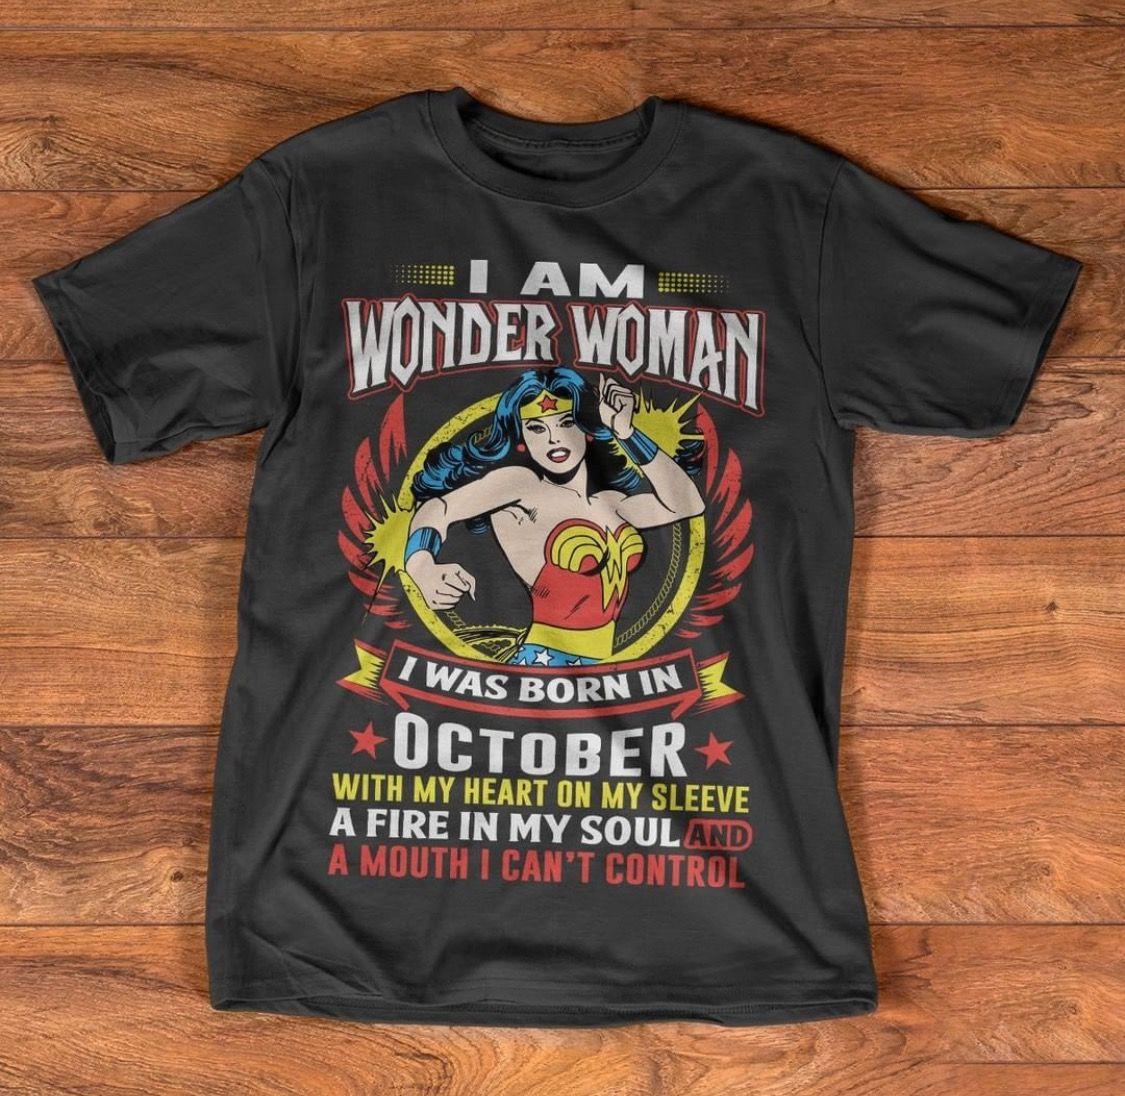 Pin by ѕυηѕнιηє☀️ on wιѕнlιѕт Wonder woman shirt, Shirts